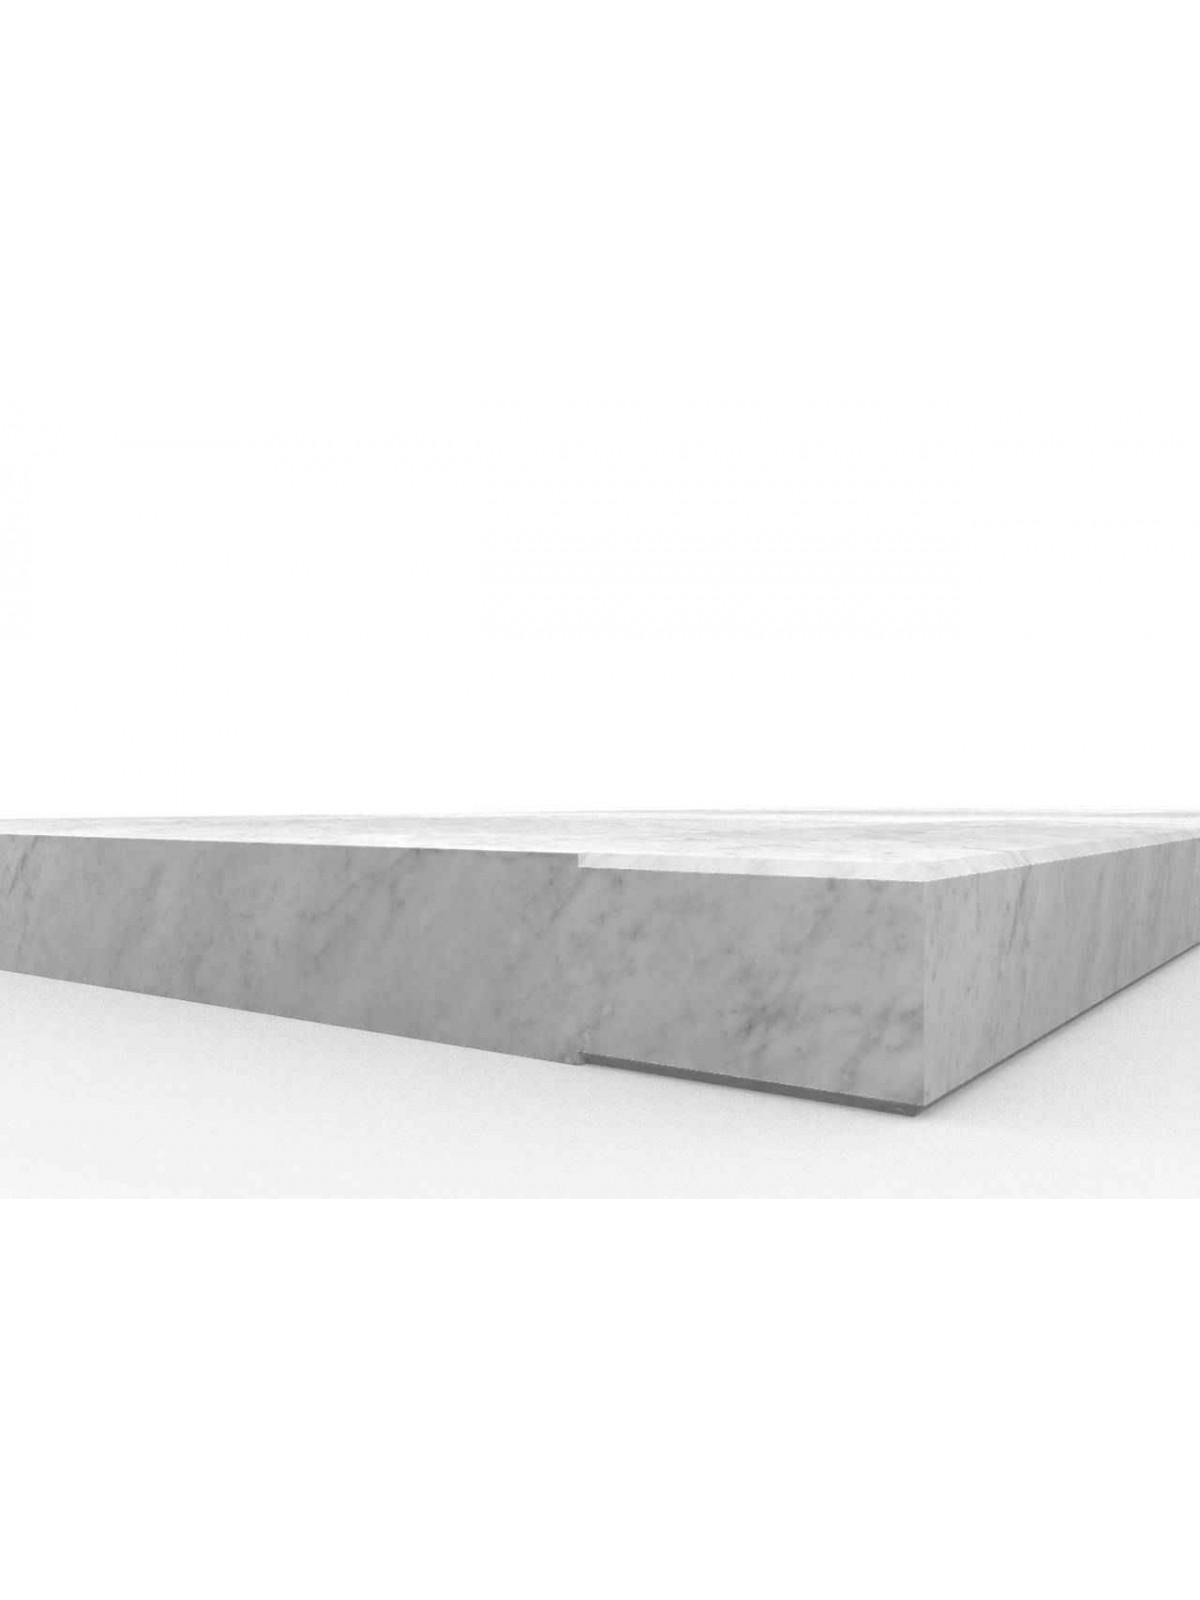 Schwellenwerte in Bianco Carrara